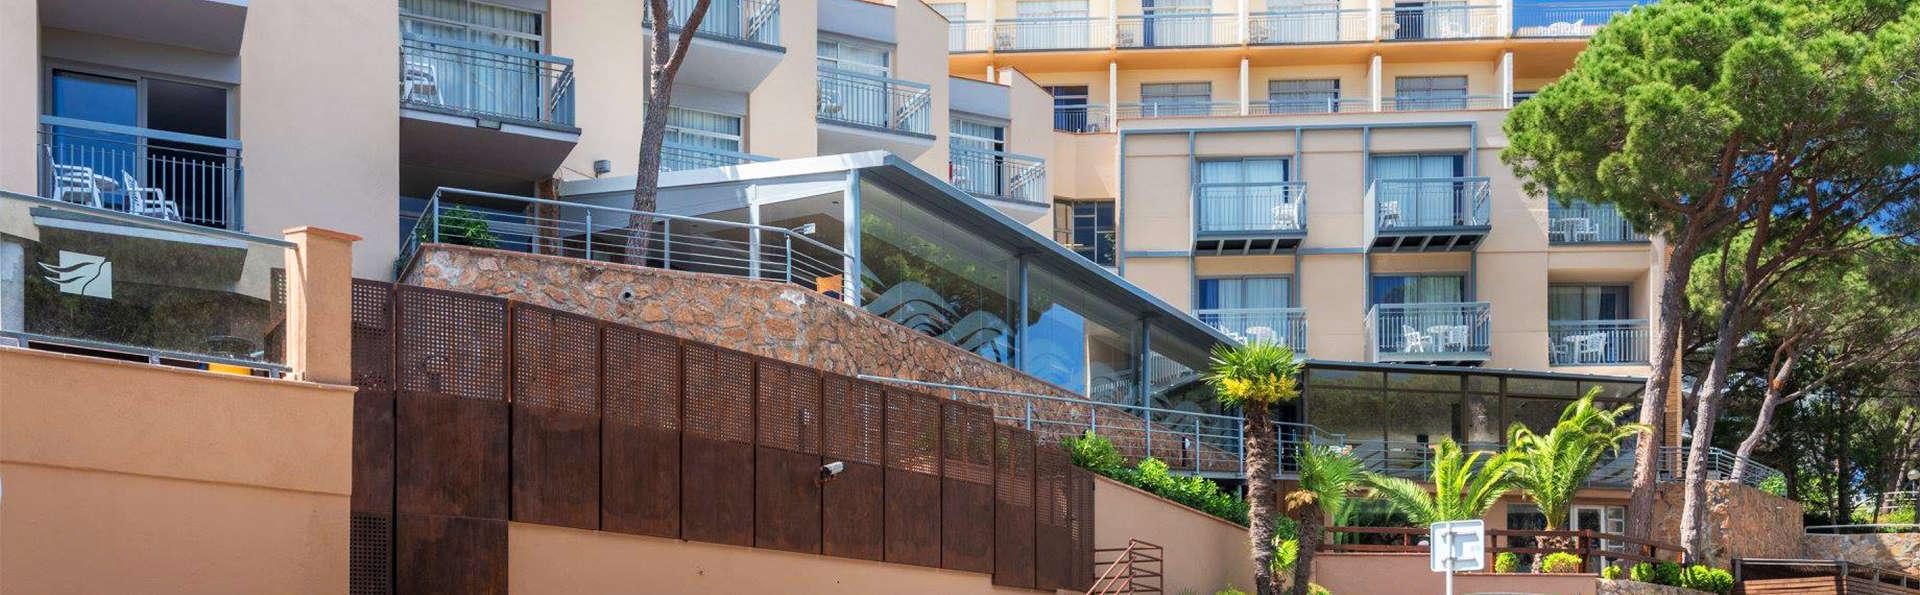 Hotel GHT S'Agaró Mar  - EDIT_0_Fachada.jpg